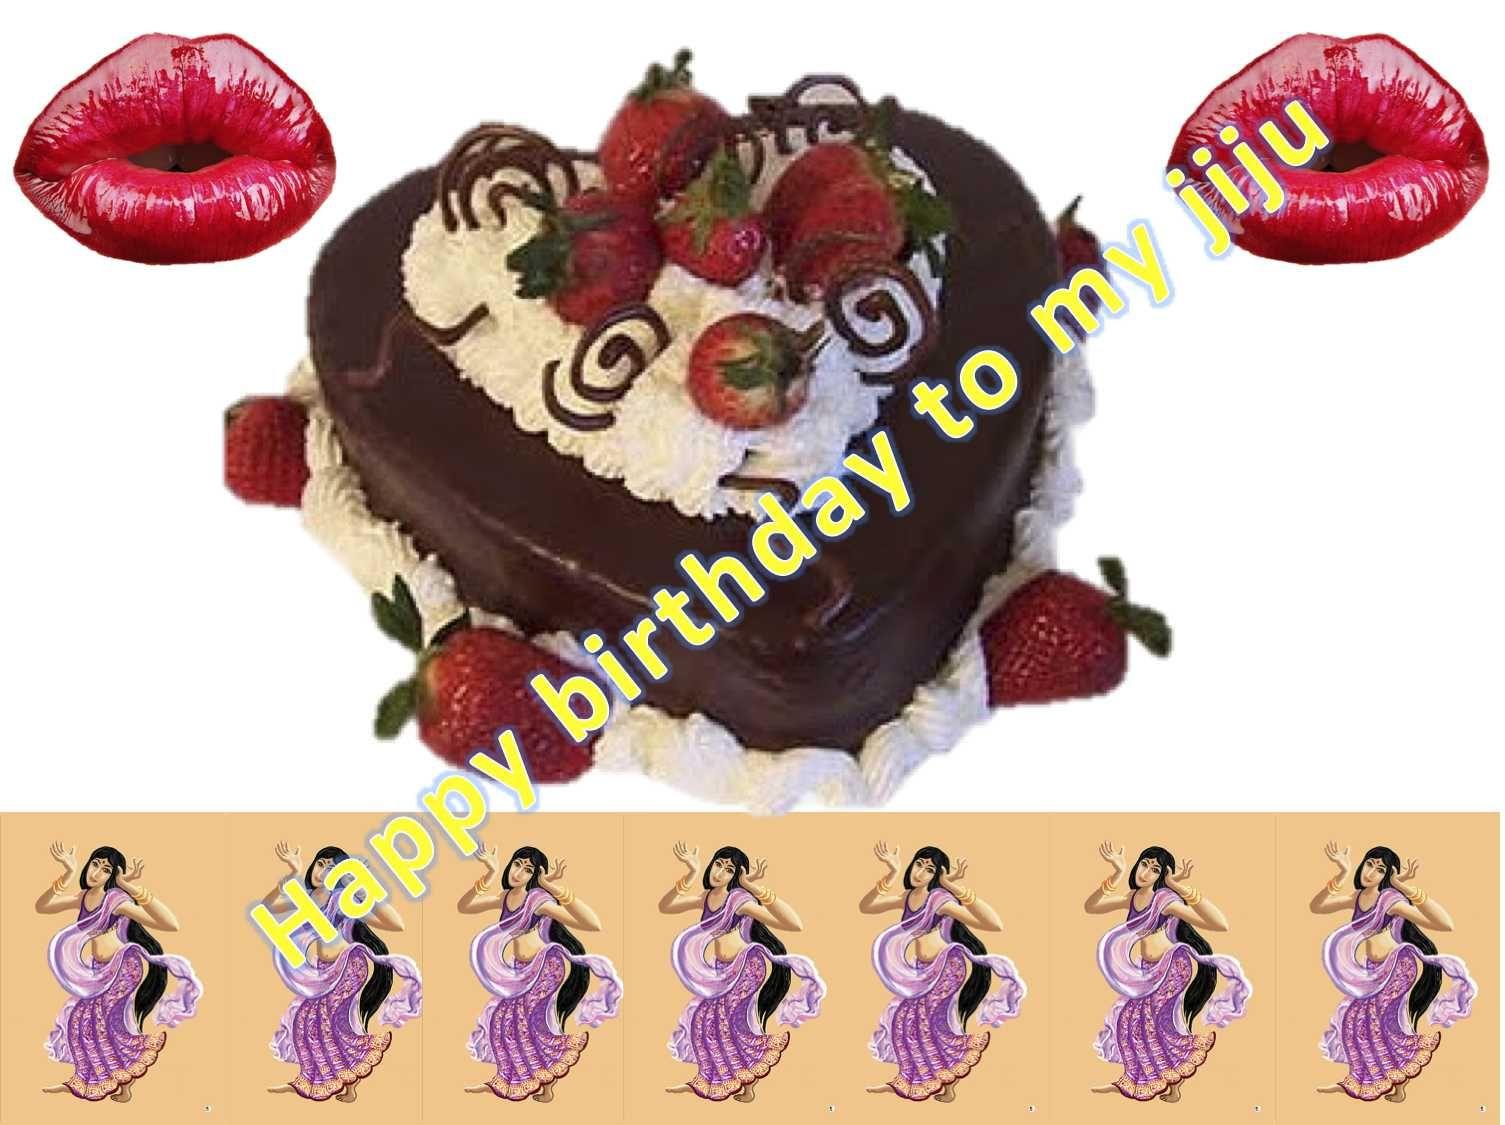 Happy Birthday Wishes For Jija With Cake Birthday Wishes For Jija